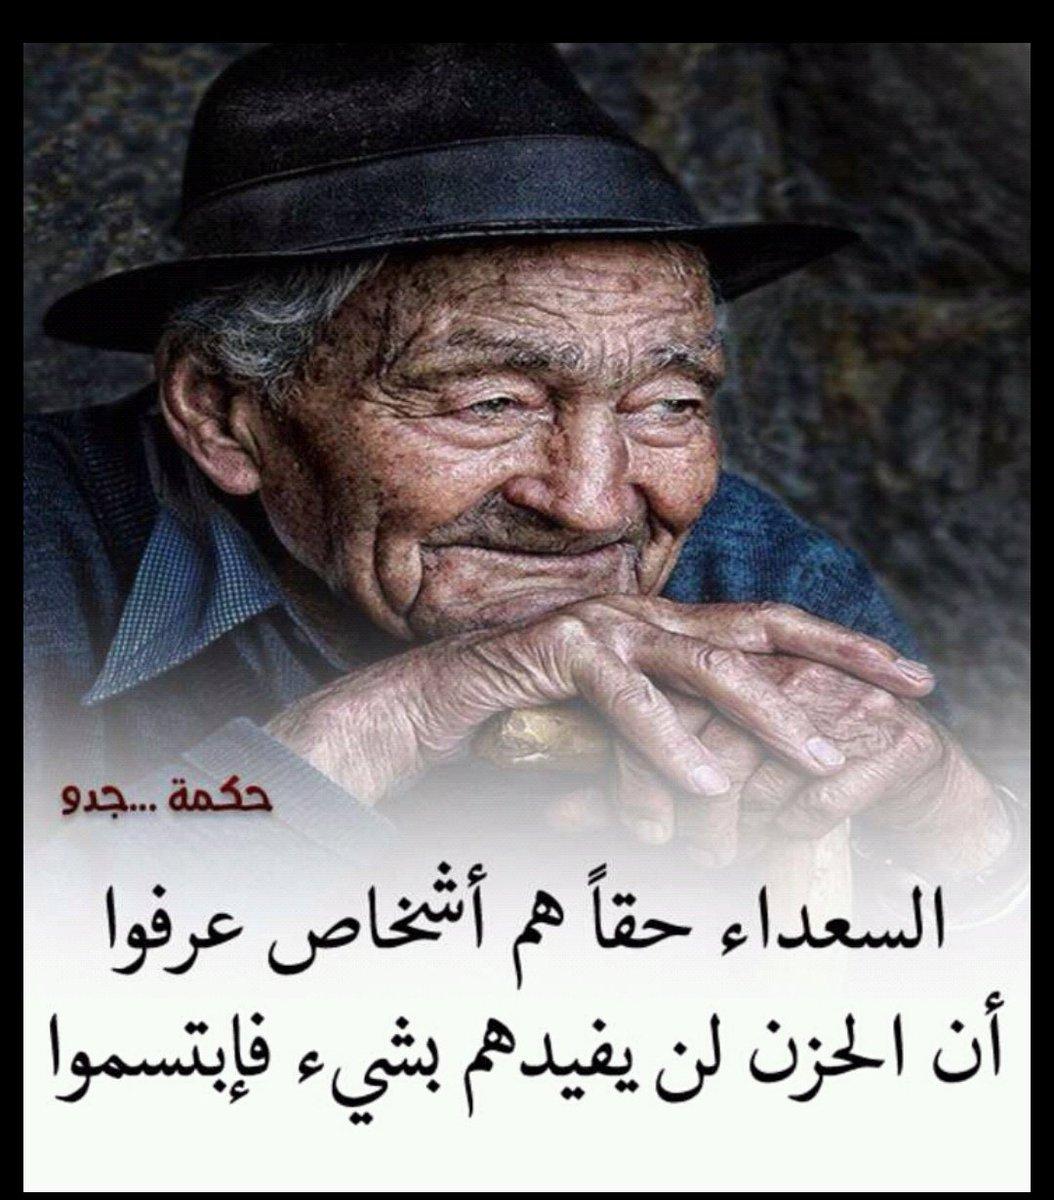 RT @moaathalamer: #جمهورك_ينتظرك_بدايه https://t.co/AUle3oc8SY